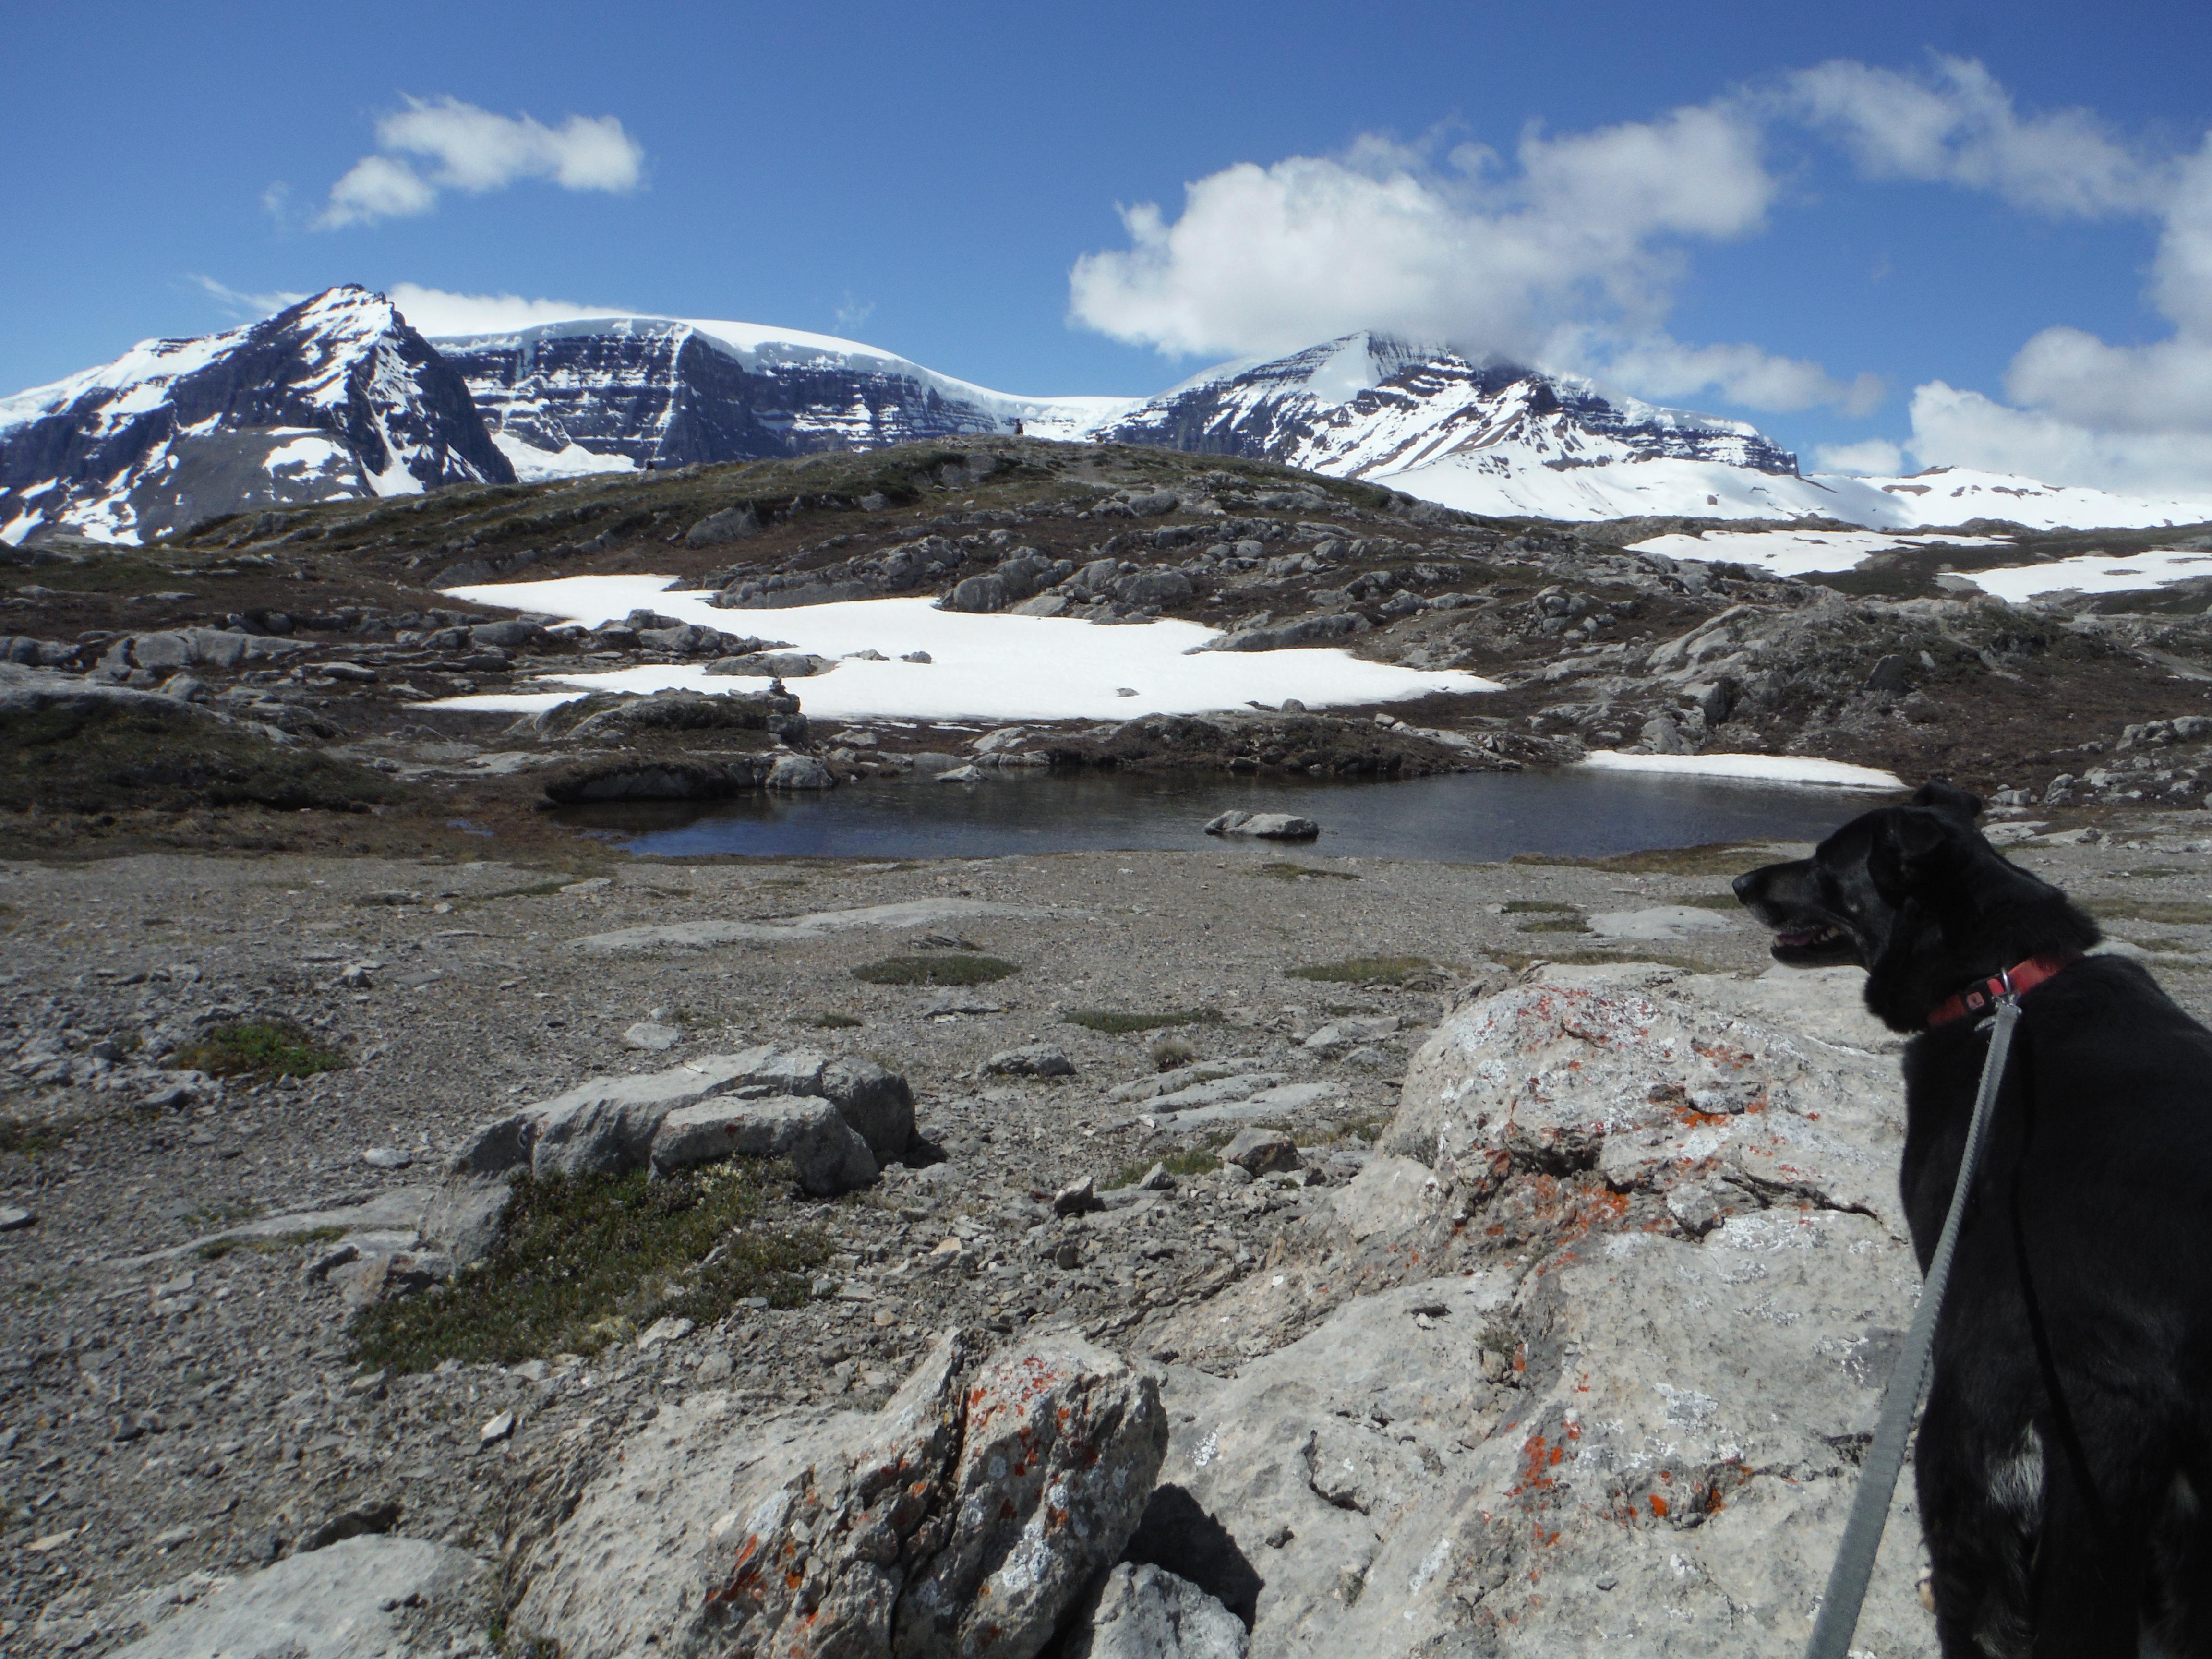 Kona Wilcox Ridge Snow Dome Mt. Kitchener Columbia Icefield Jasper National Park